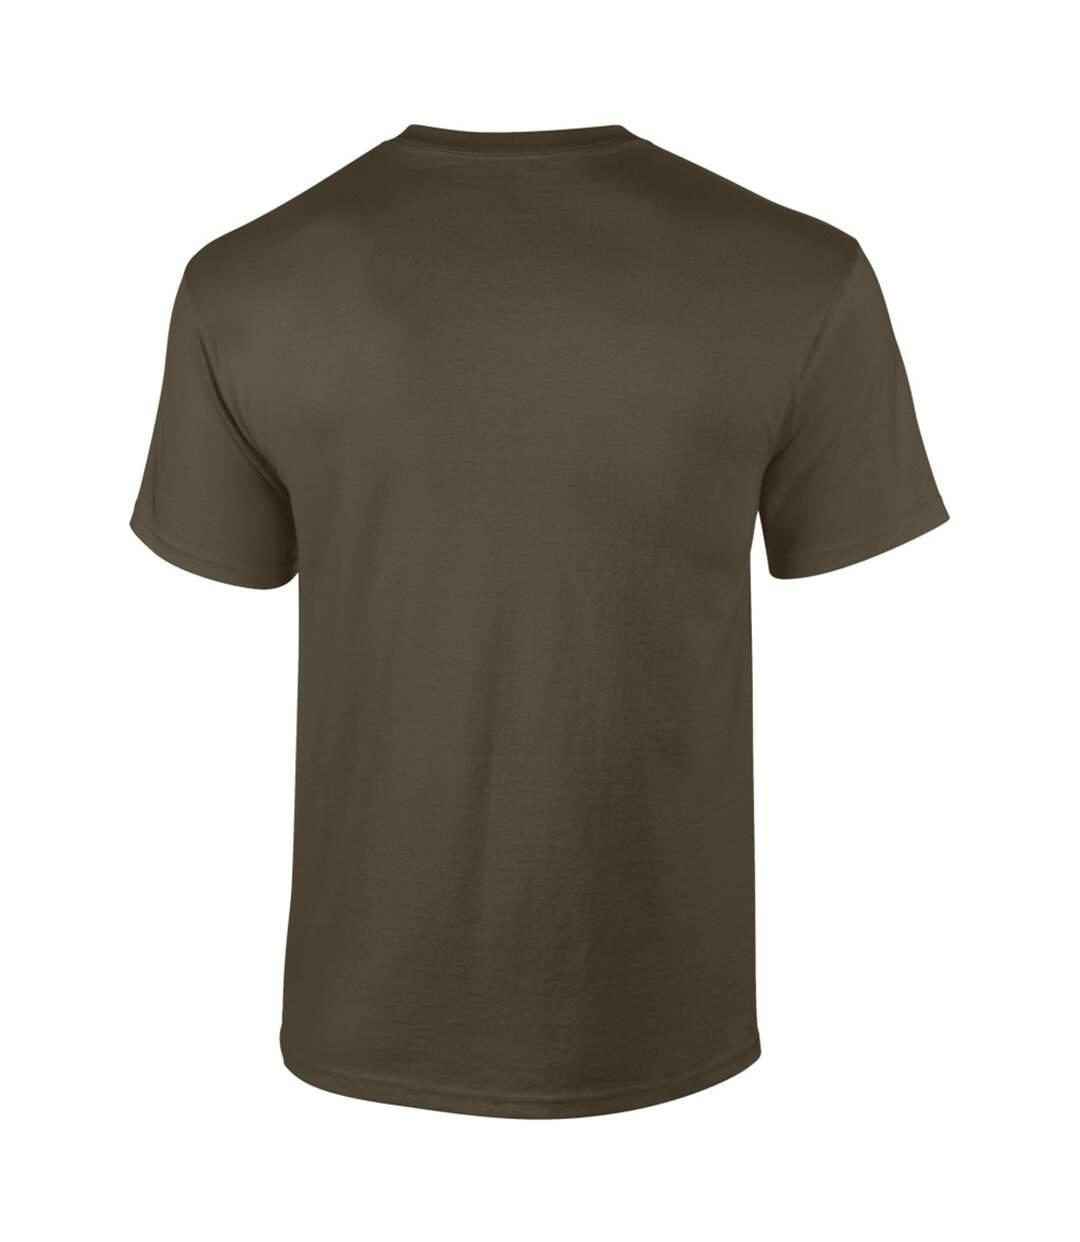 Gildan - T-shirt à manches courtes - Homme (Iris) - UTBC475